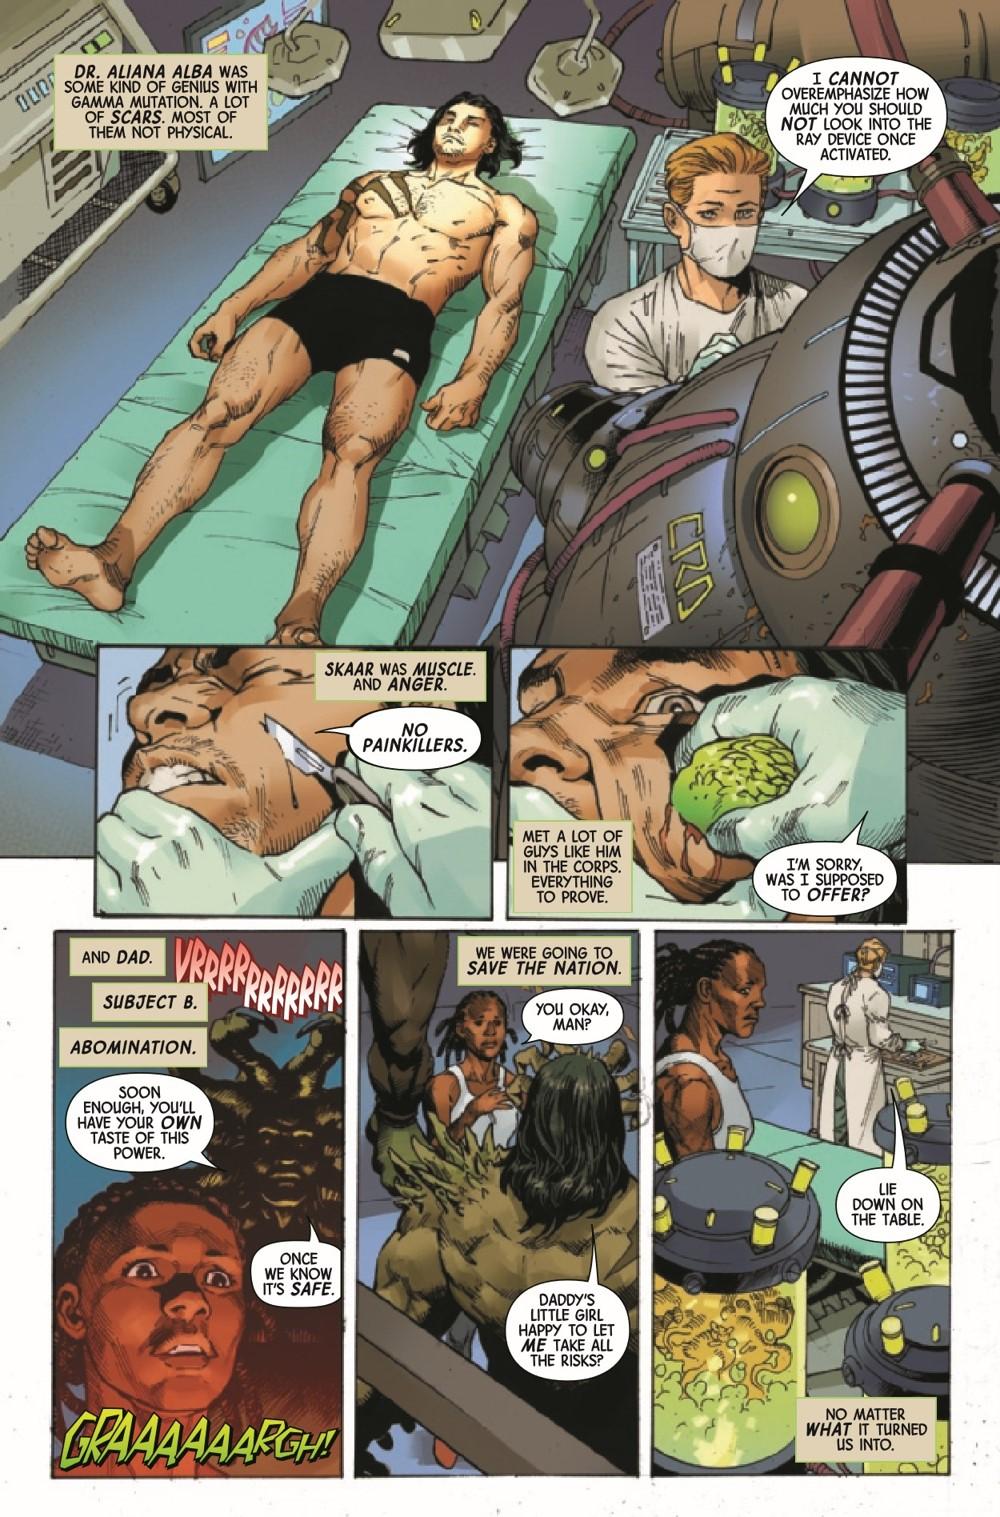 GAMMAF2021004_Preview-5 ComicList Previews: GAMMA FLIGHT #4 (OF 5)